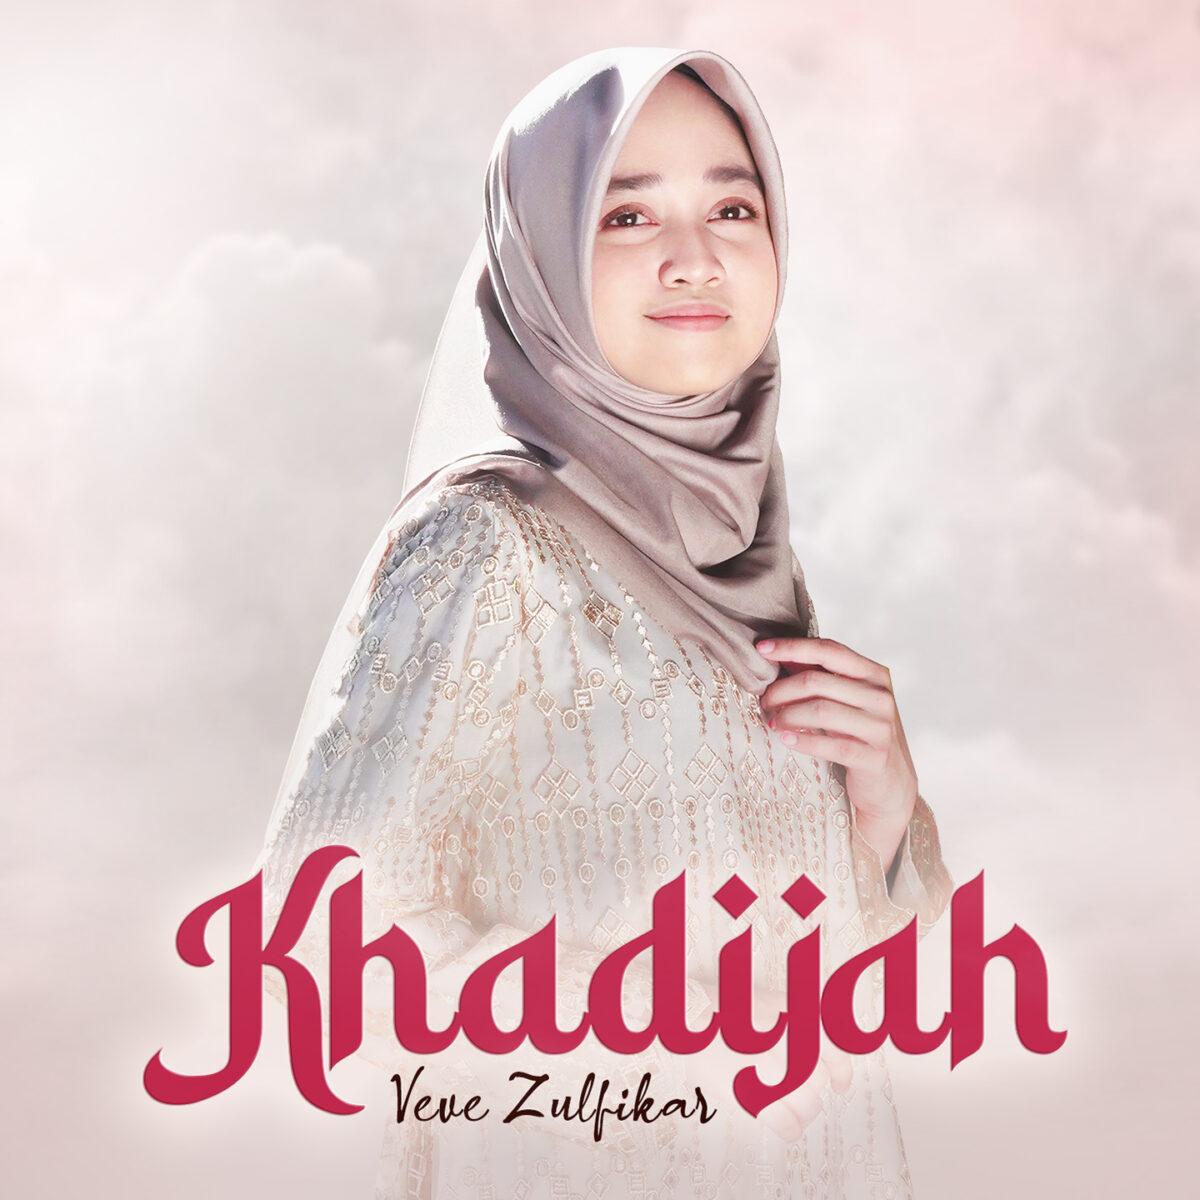 Veve Zulfikar, Menginspirasi Cinta Melalui Tembang Khadijah